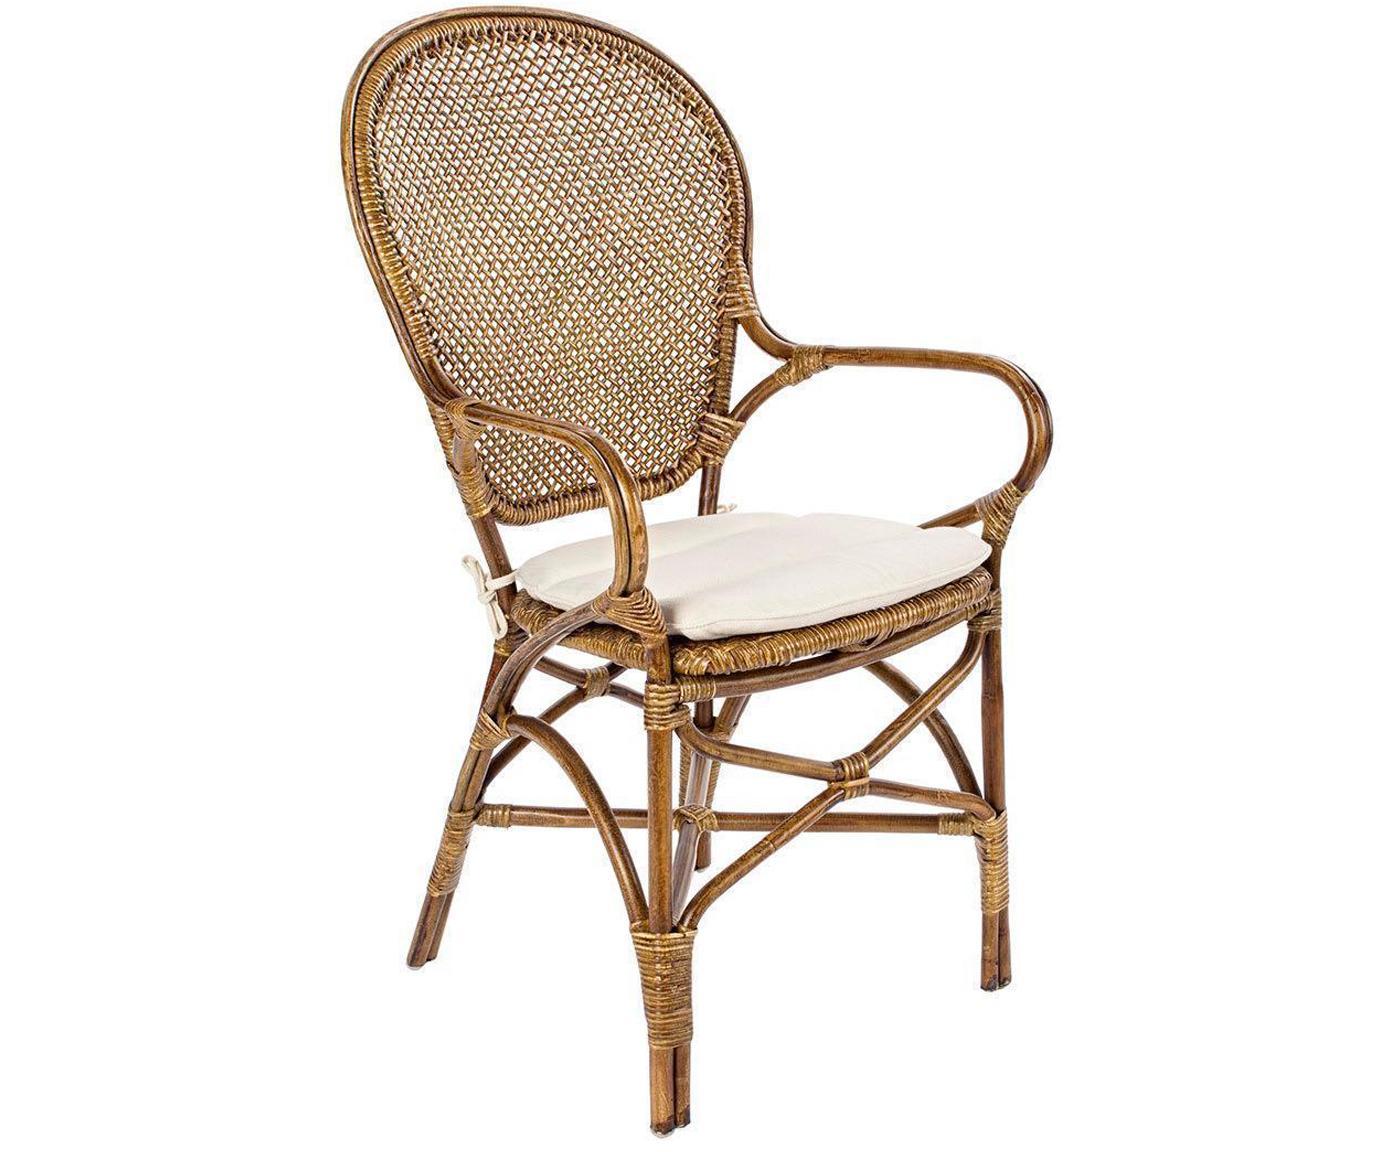 Silla con reposabrazos Miel, Estructura: madera de ratán pintada, Asiento: algodón, Blanco, marrón, An 55 x L 96 cm